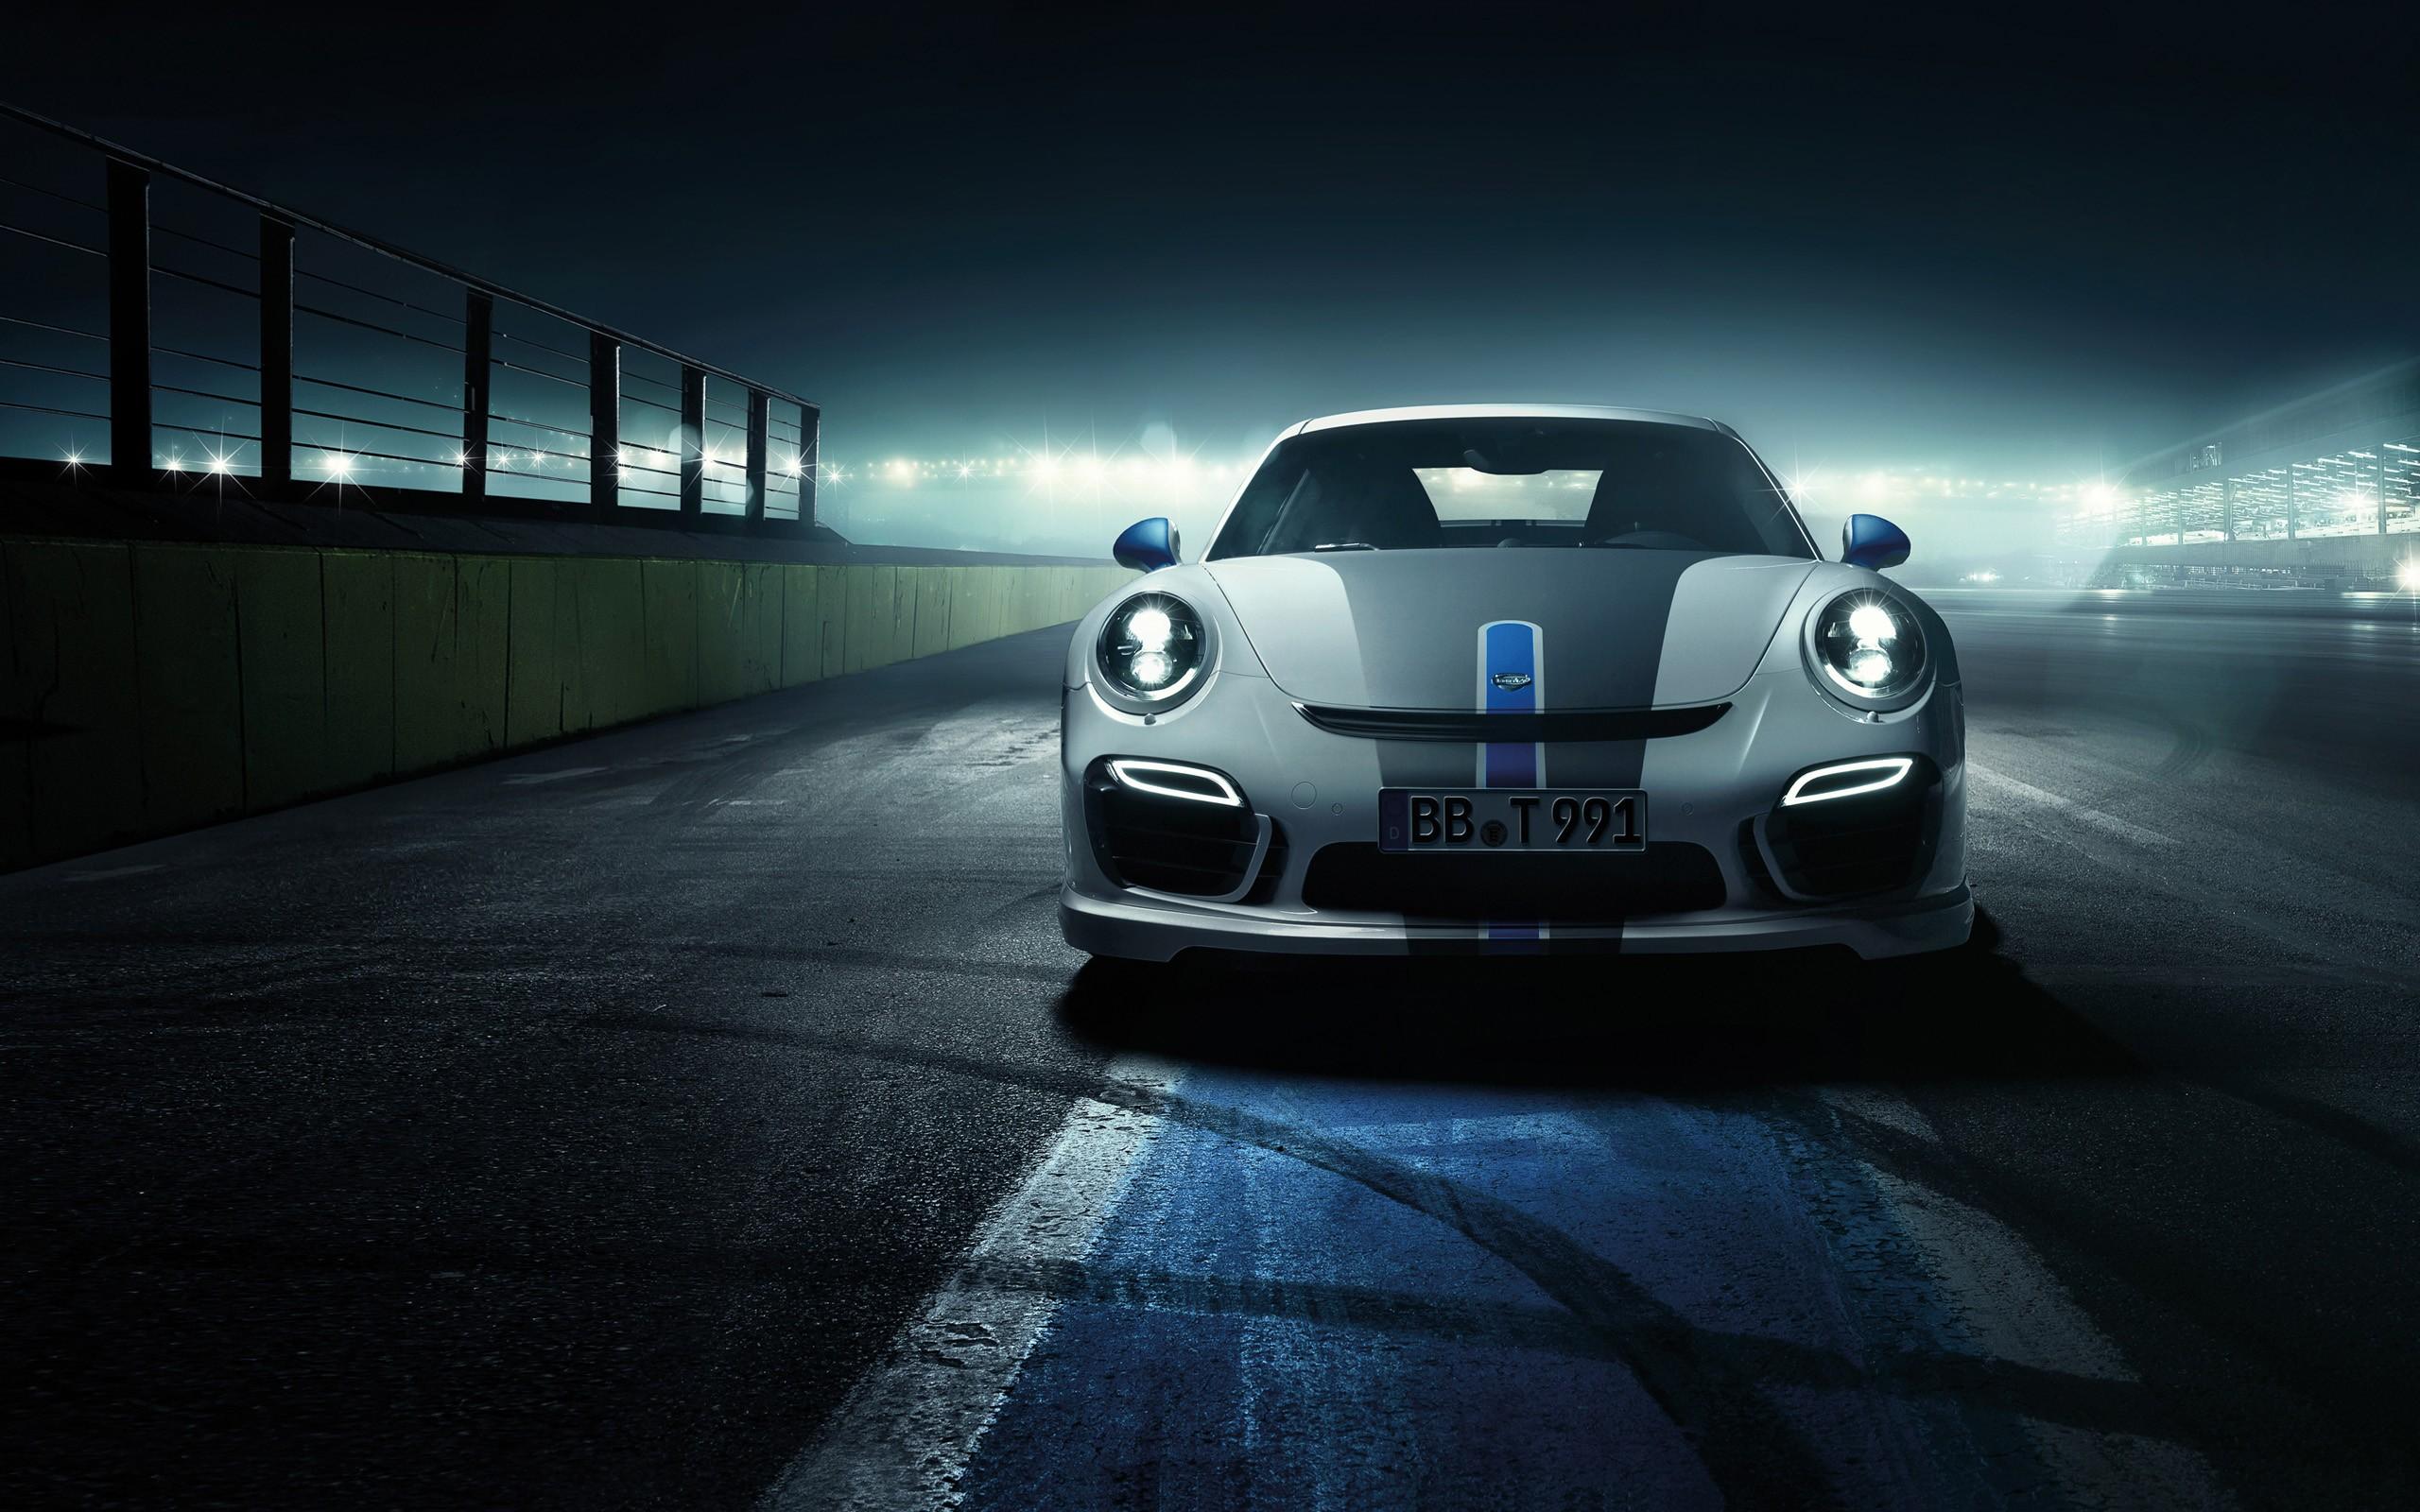 Wallpaper Korea 3d Techart Porsche 911 Turbo 2014 Wallpaper Hd Car